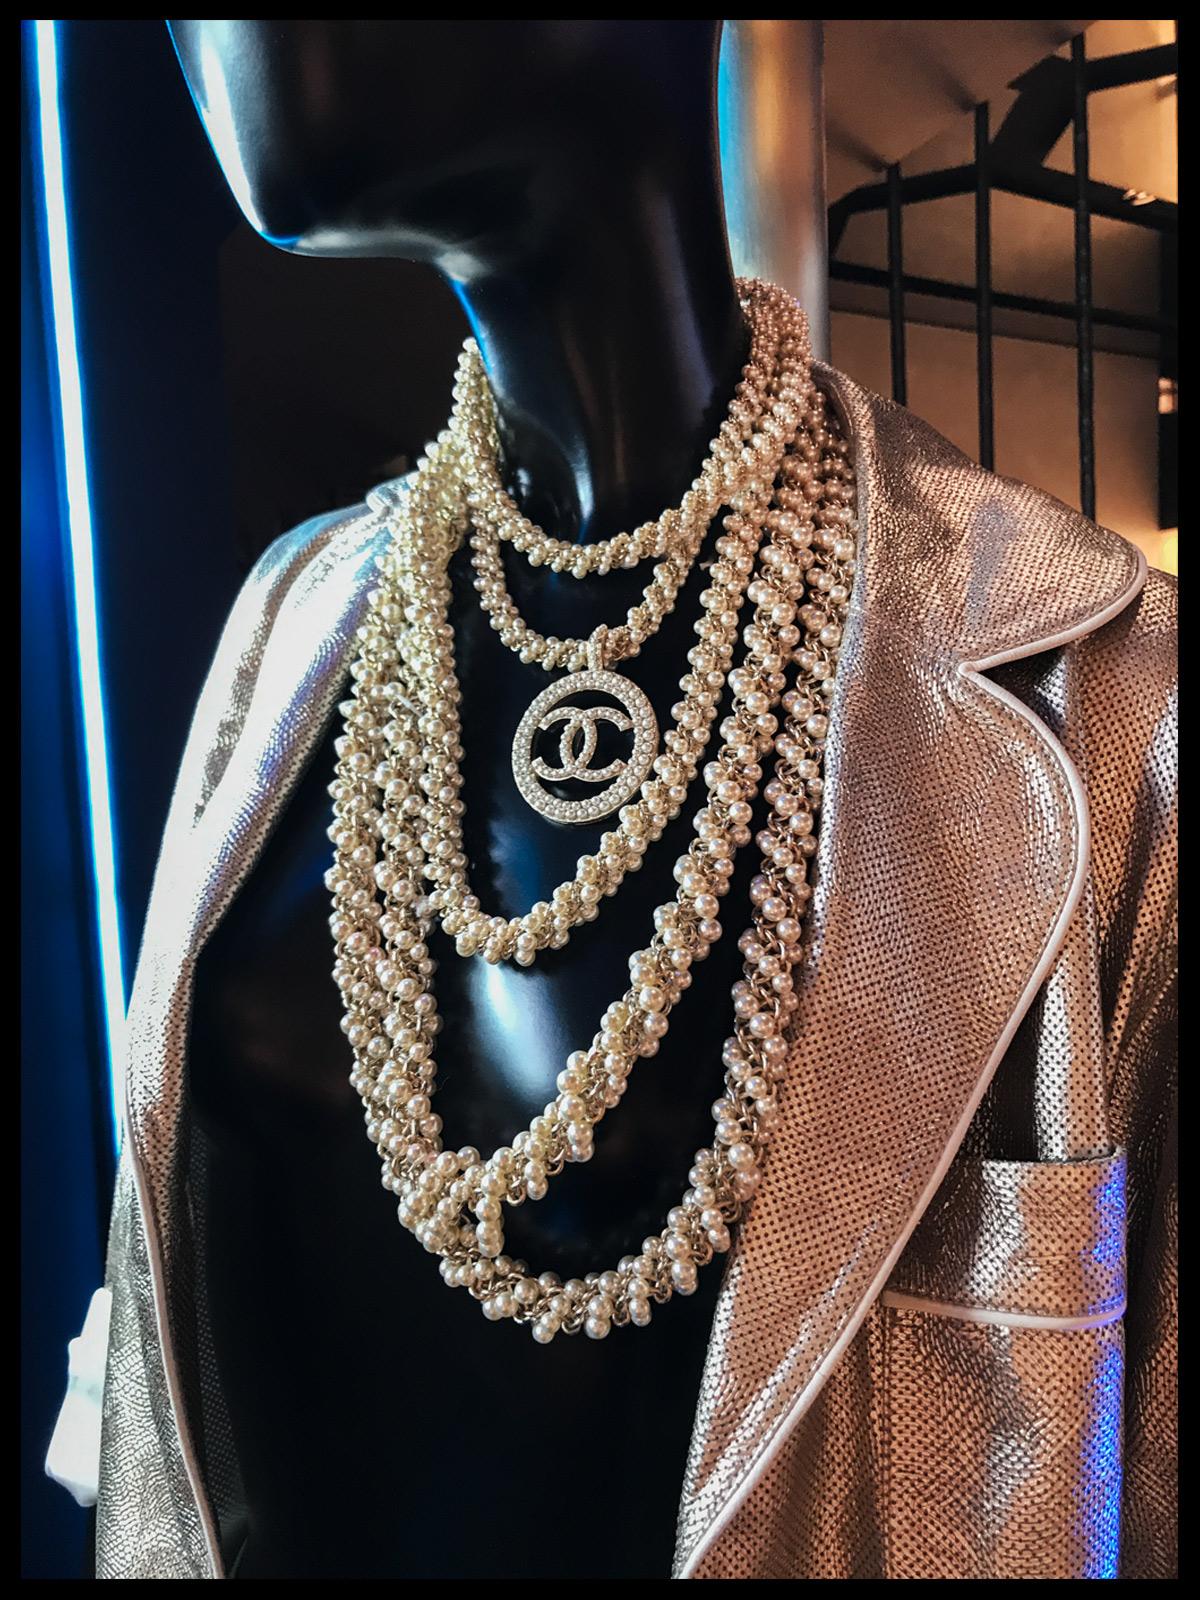 Stylesnooperdan-Chanel-at-Marais-Melbourne-5.jpg